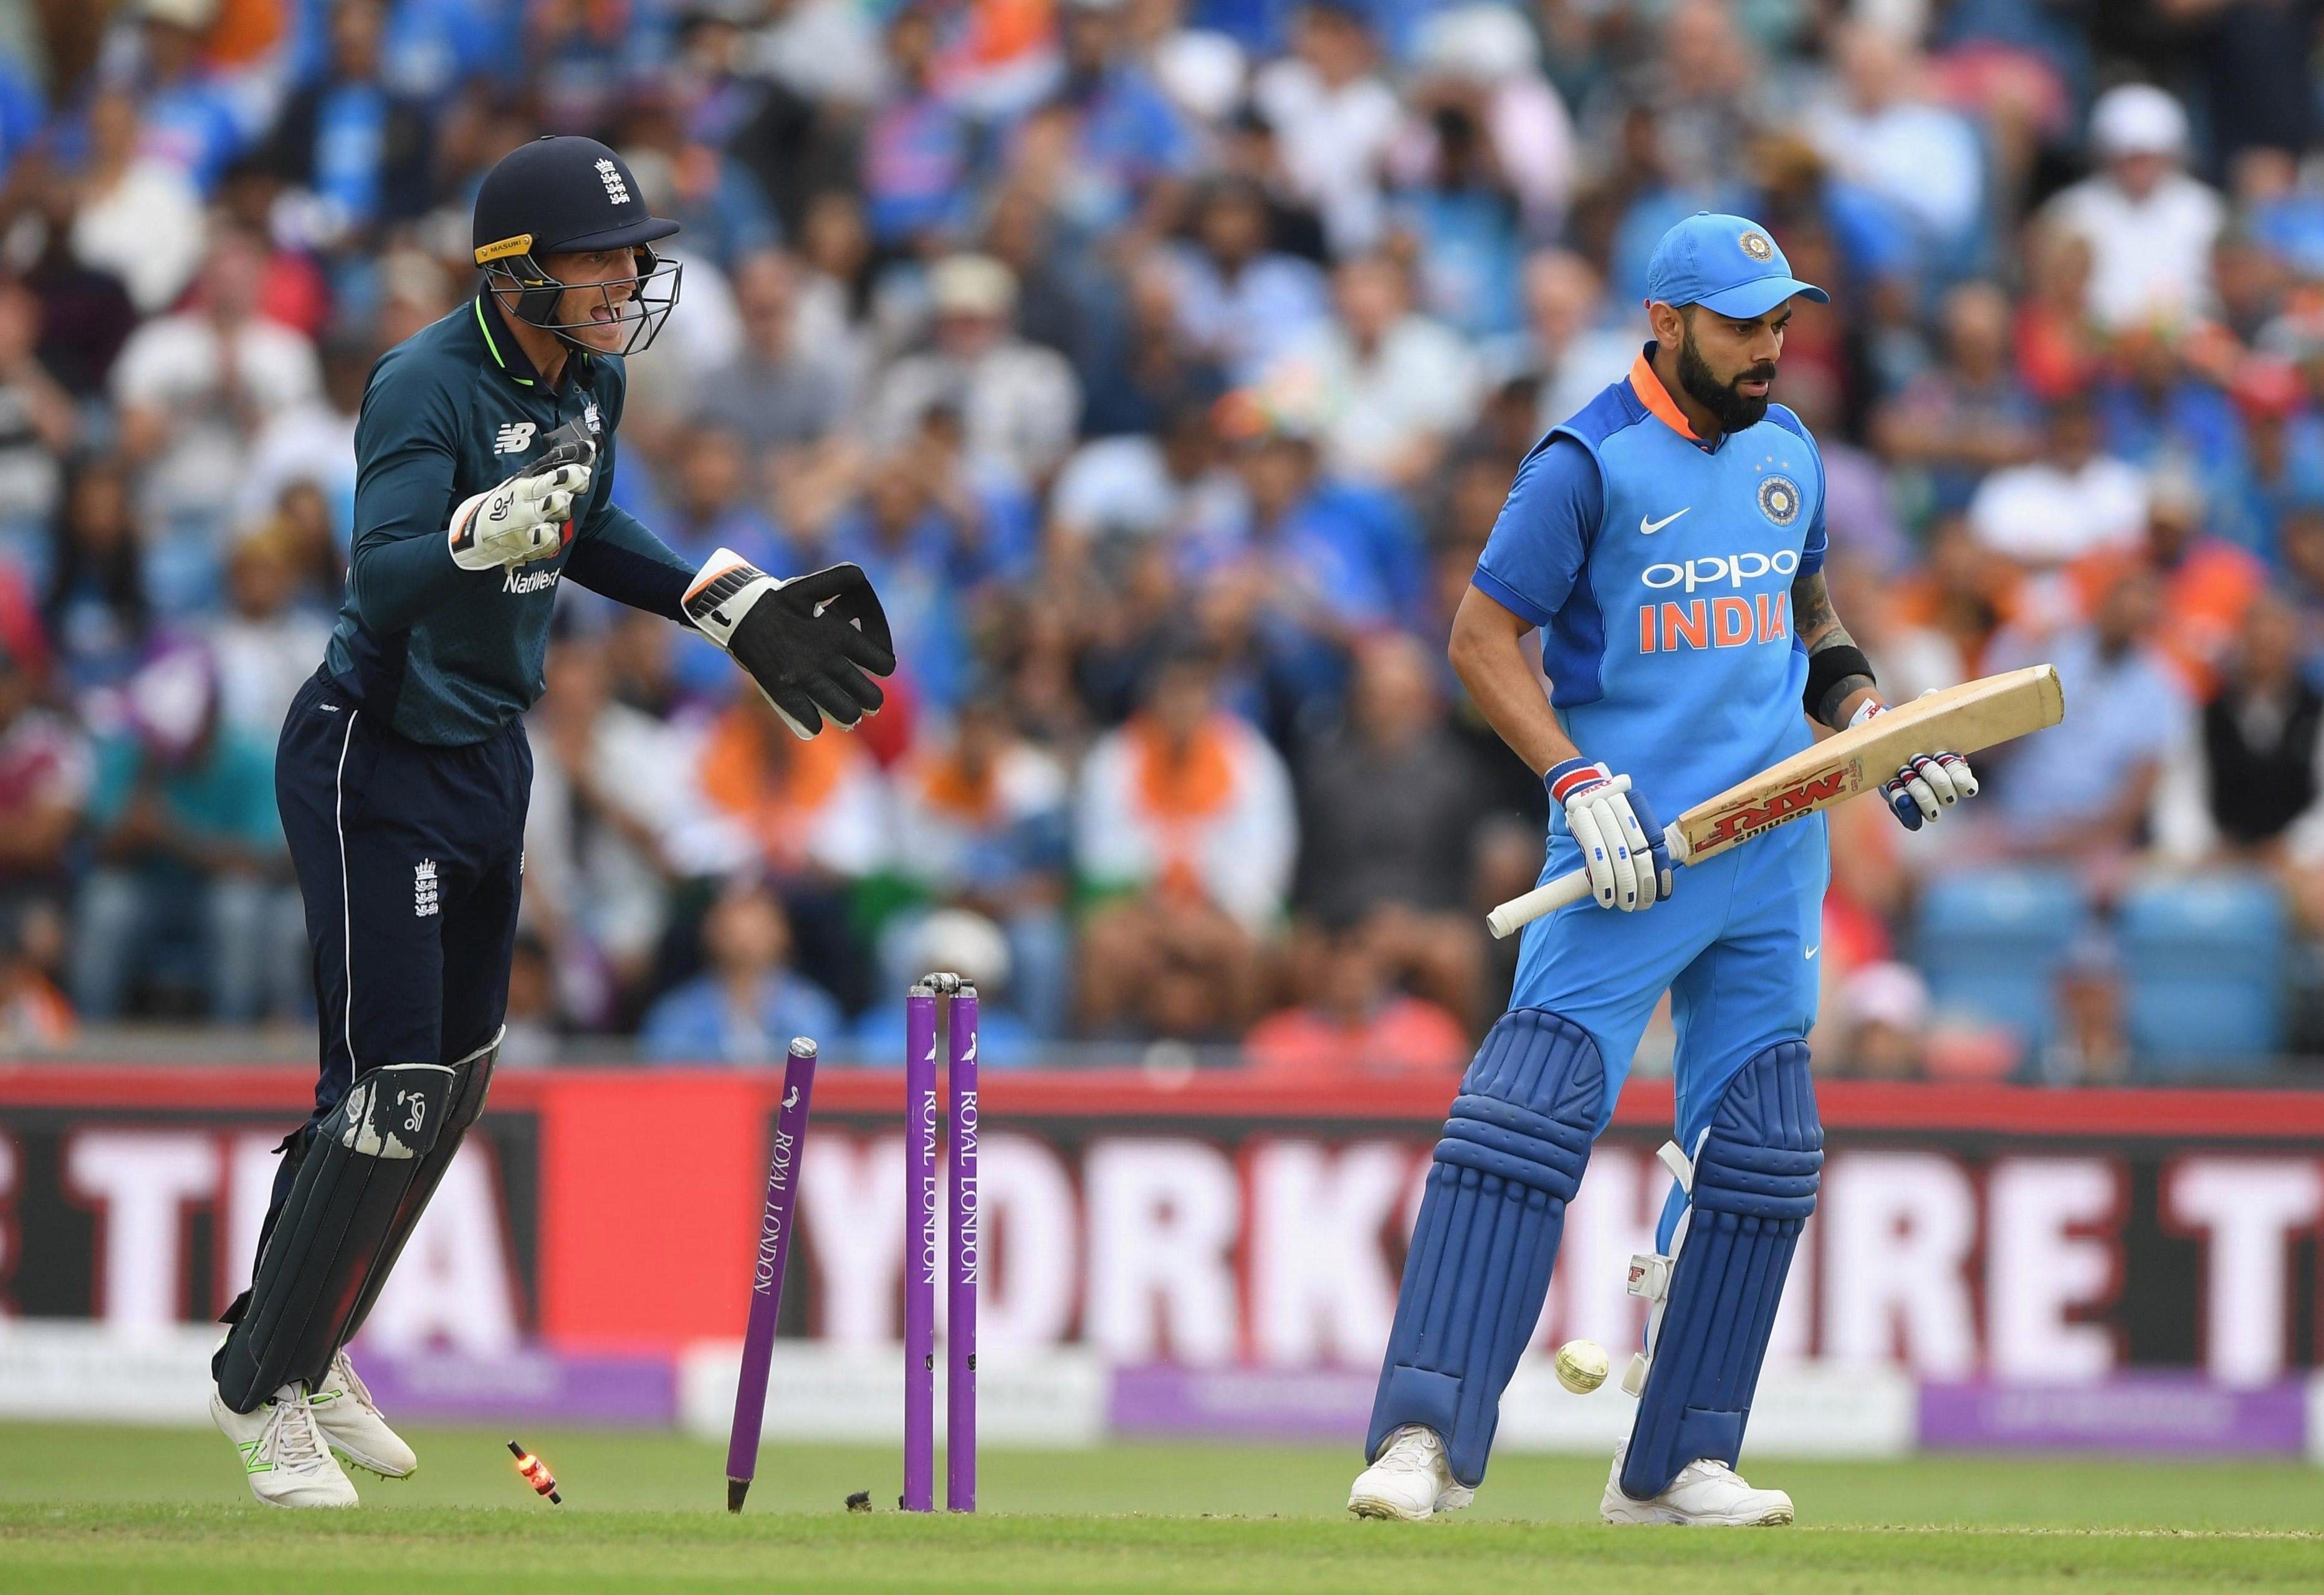 Adil Rashid bowled Virat Kohli with a brilliant leg-spinner